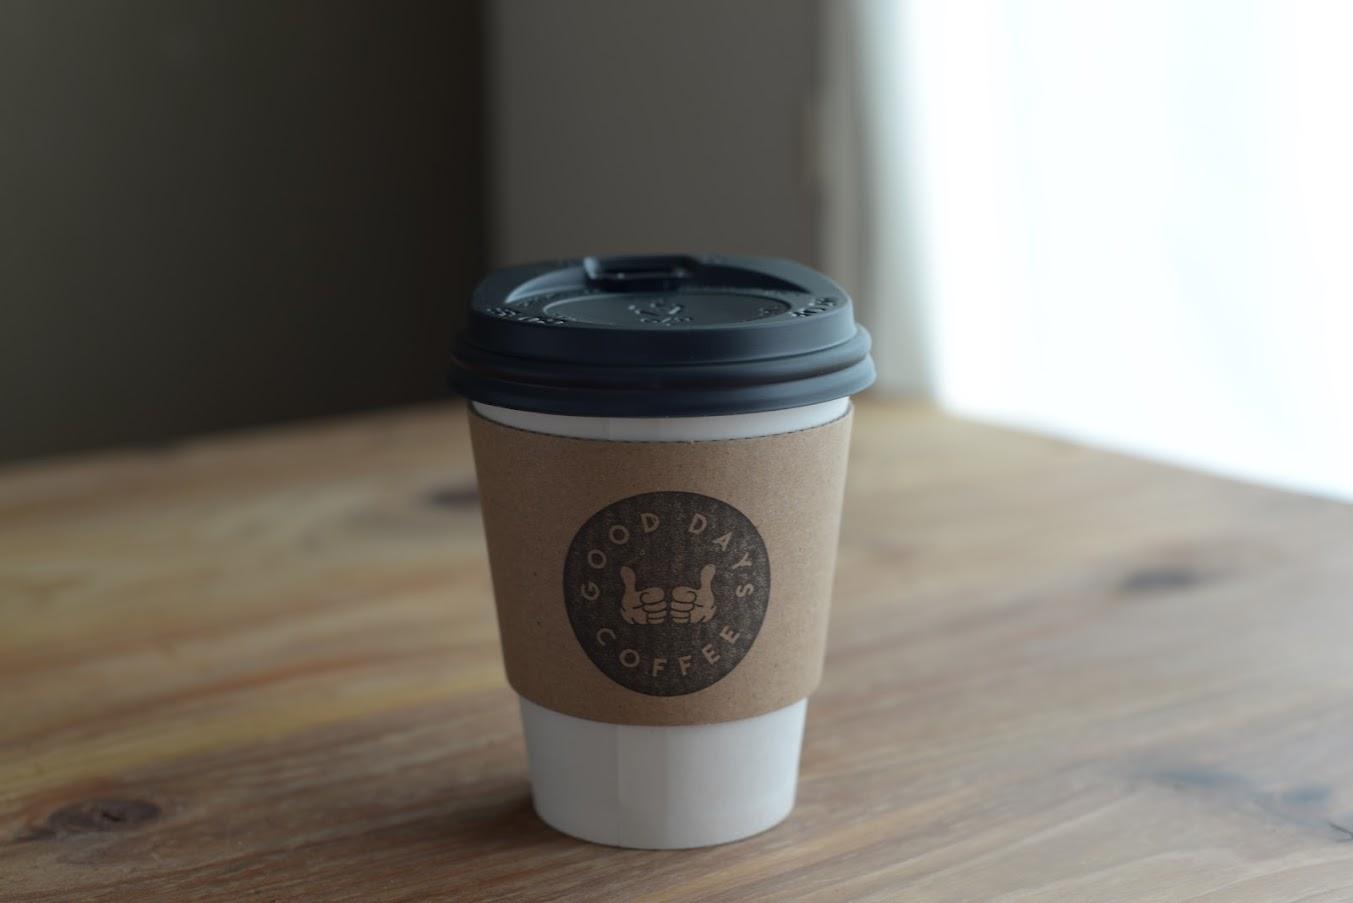 GOODDAYSCOFFEEのホットコーヒー